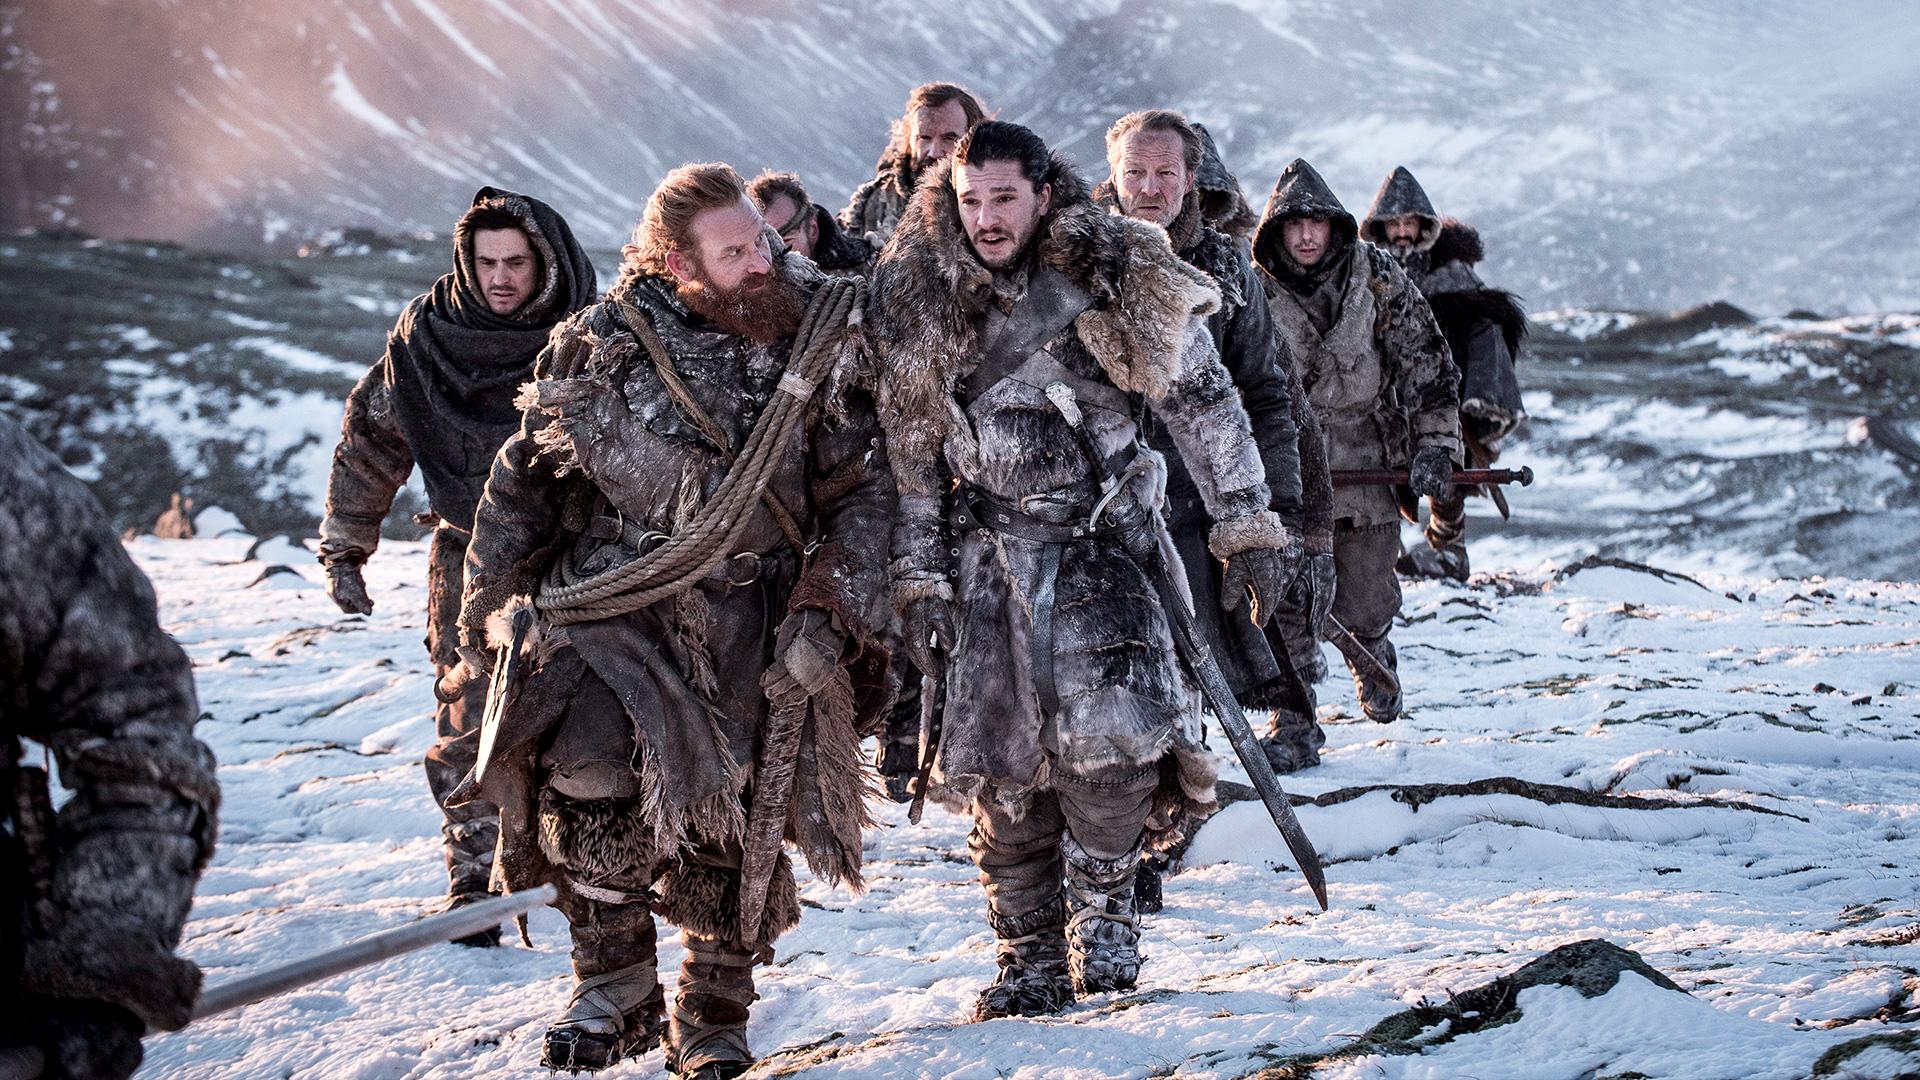 Game Of Thrones Season 8 Leak Reveals A Surprising Season 7